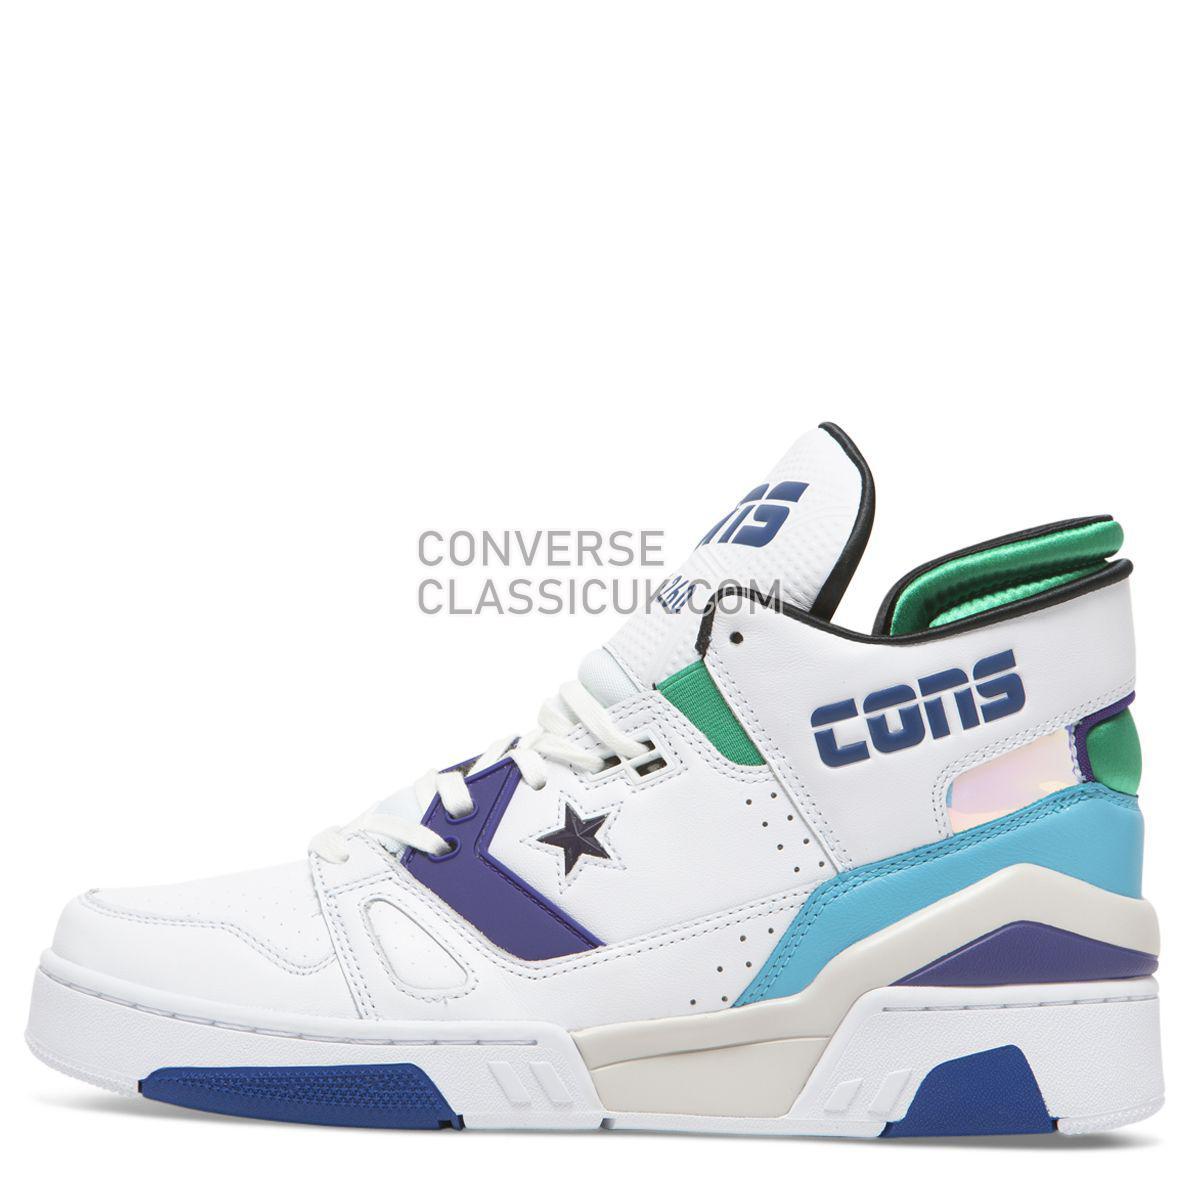 Converse X Don C ERX 260 Jewel Mid White/Court Purple Mens 163779 White/Court Purple/Bold Jade Shoes